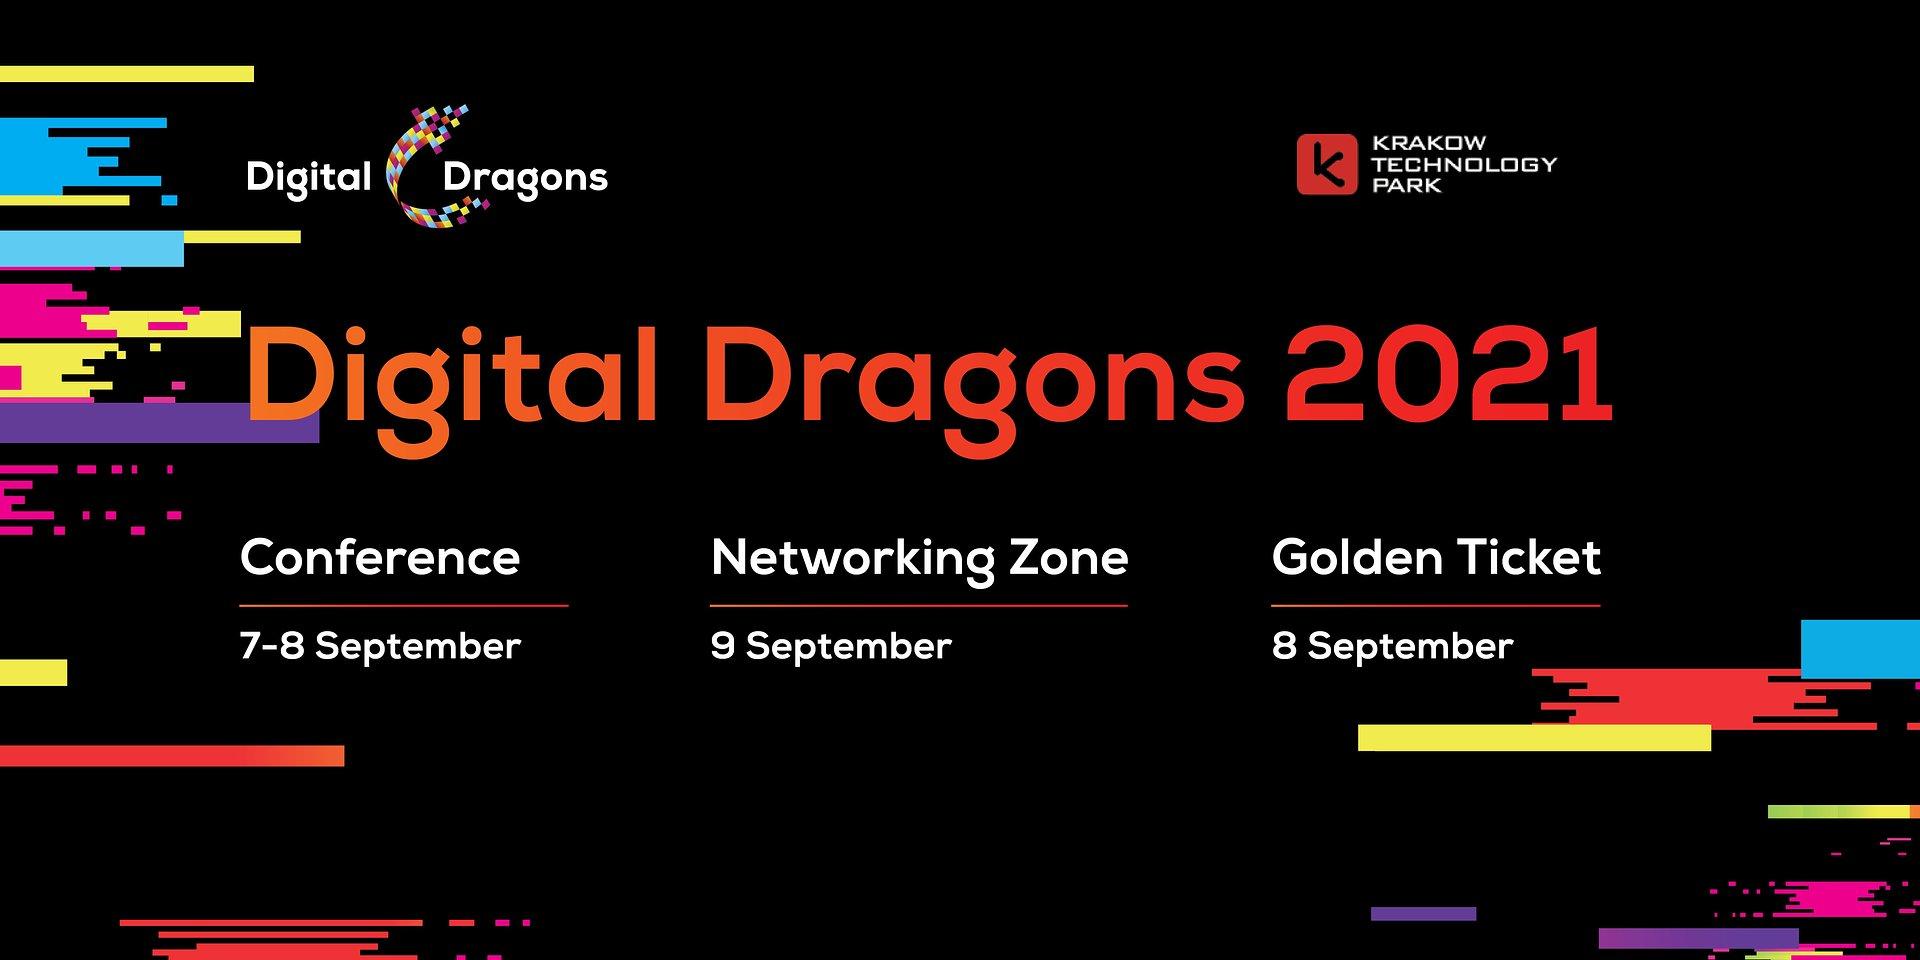 Давайте встречаться онлайн и офлайн на нетворкинге Digital Dragons в Кракове!